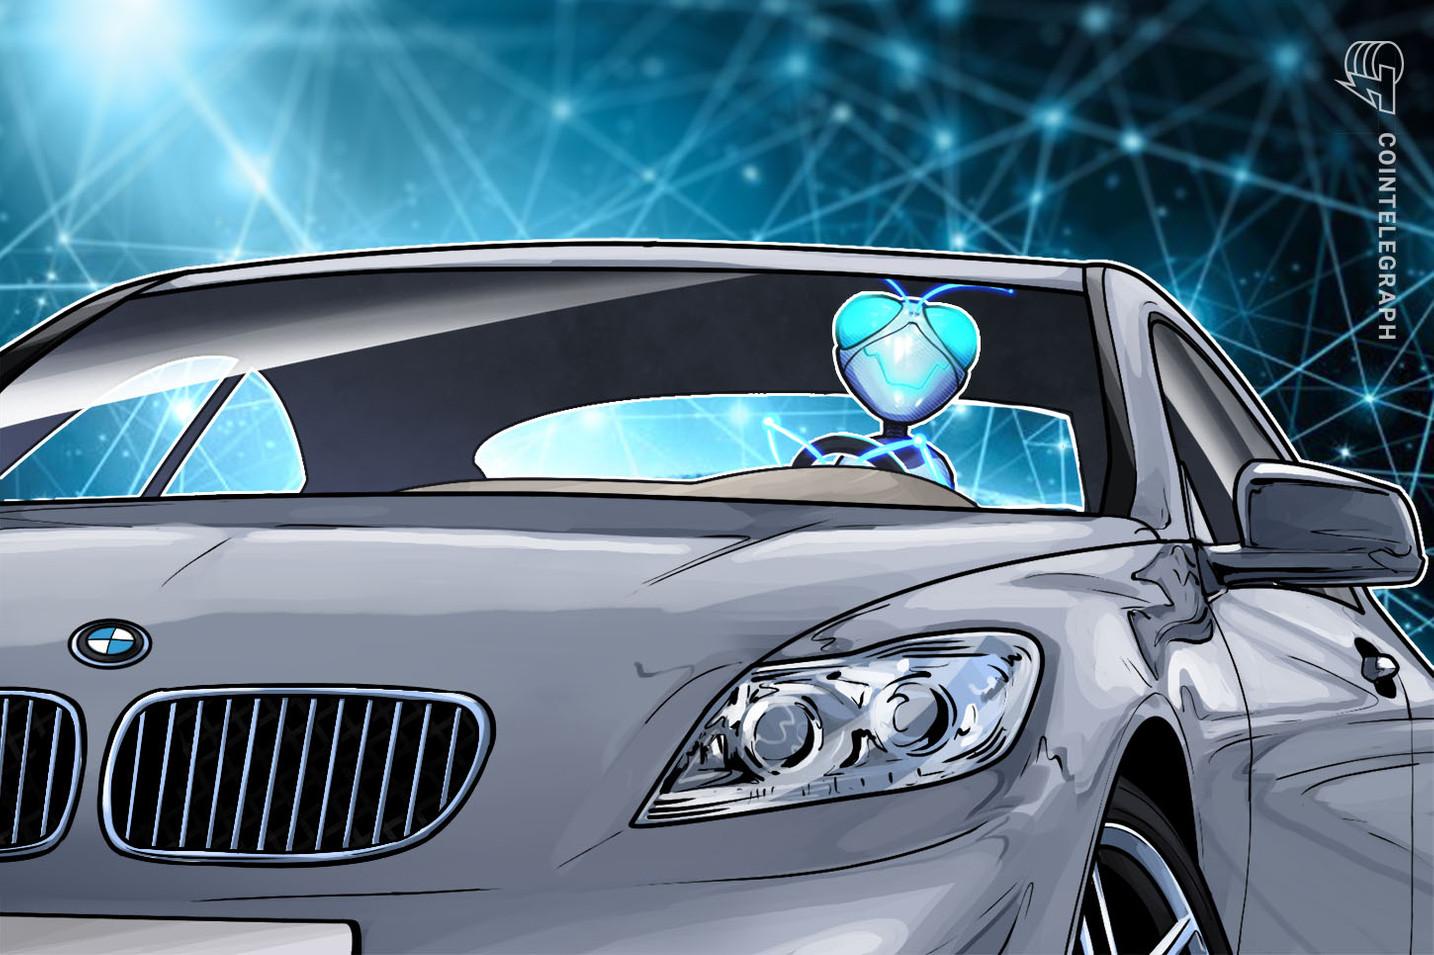 BMW Korea trials a blockchain-powered rewards program ahead of global launch